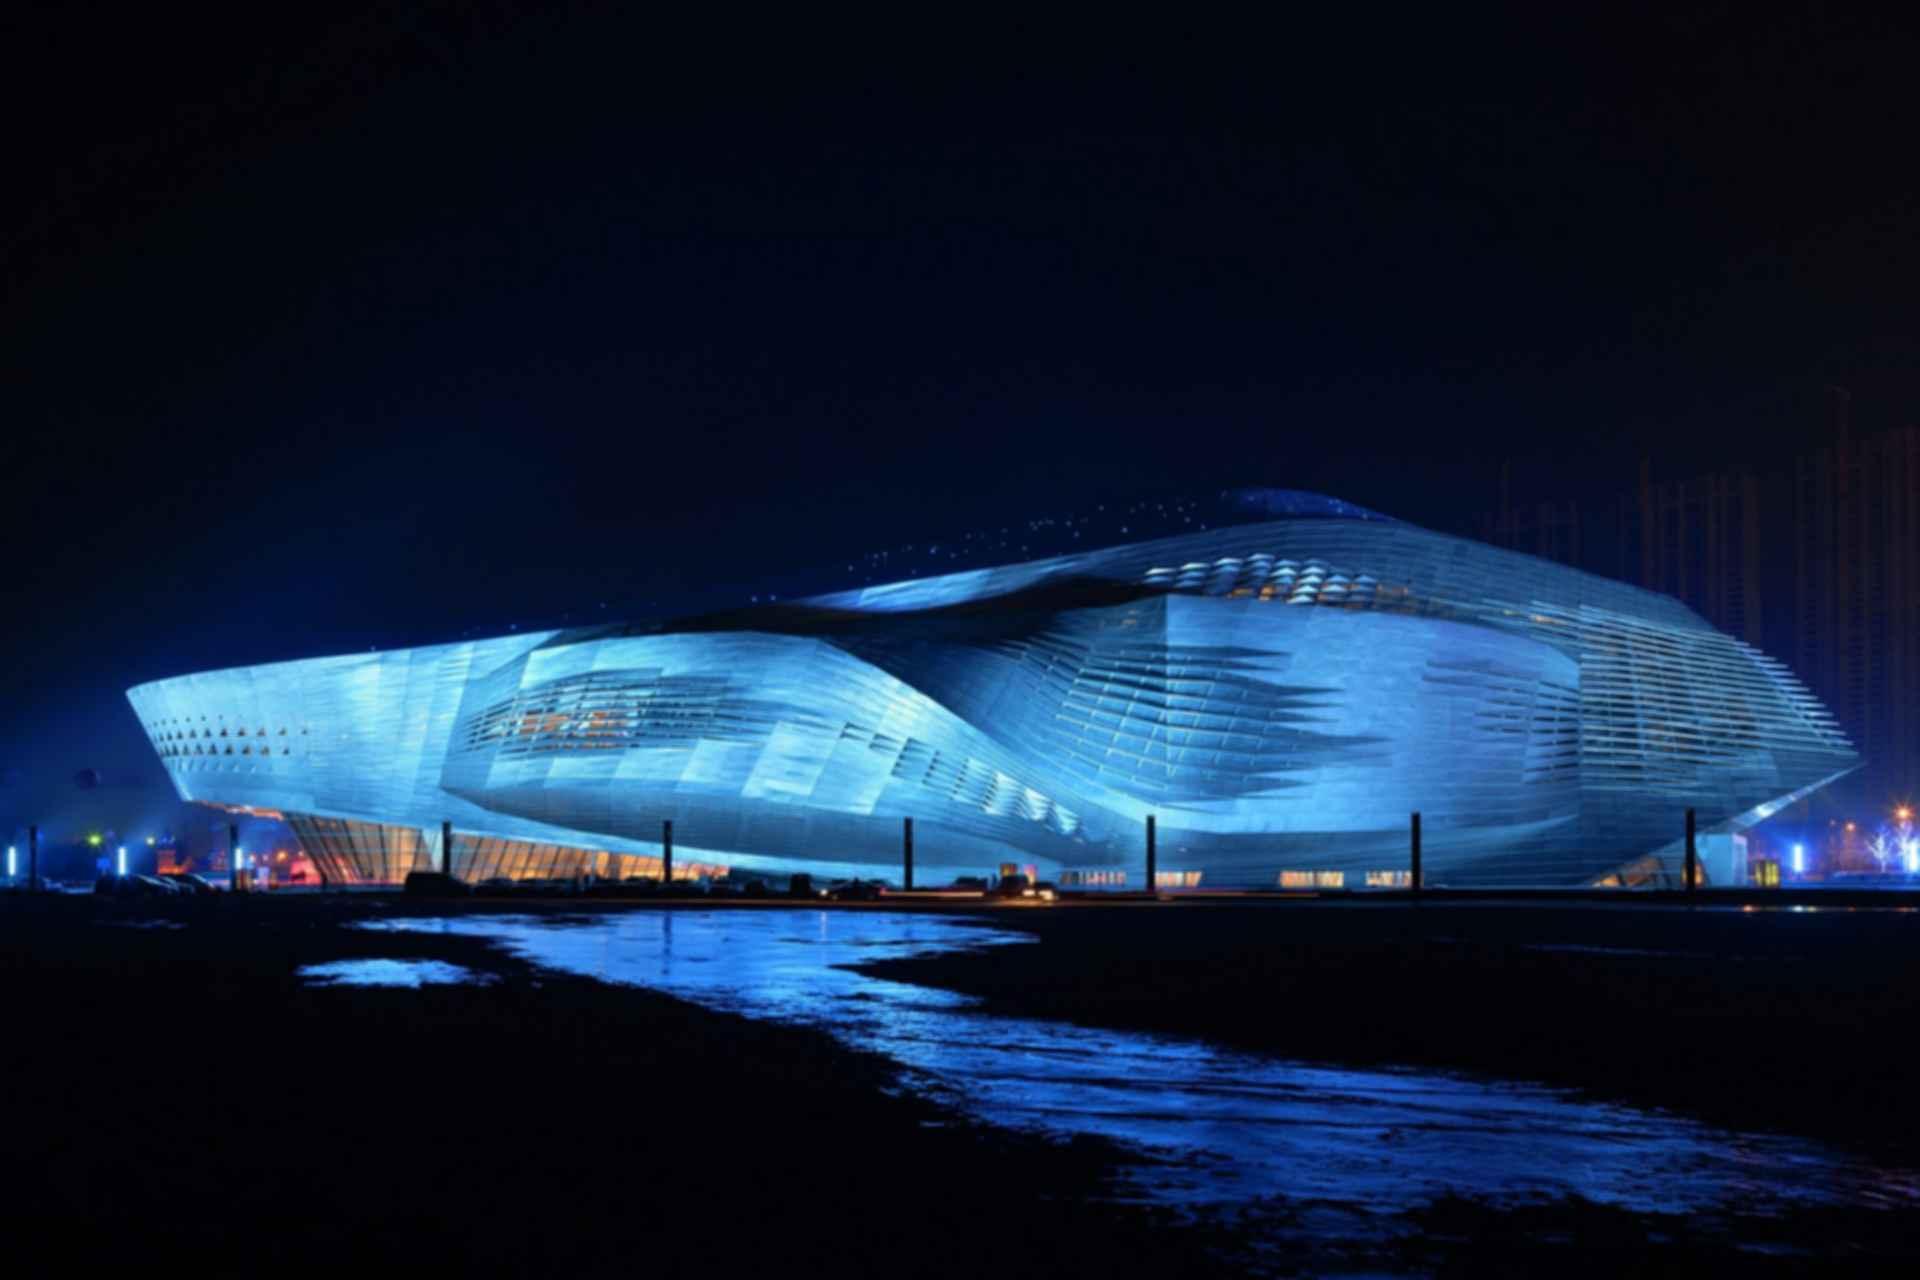 Dalian International Convention Center - Exterior at Night